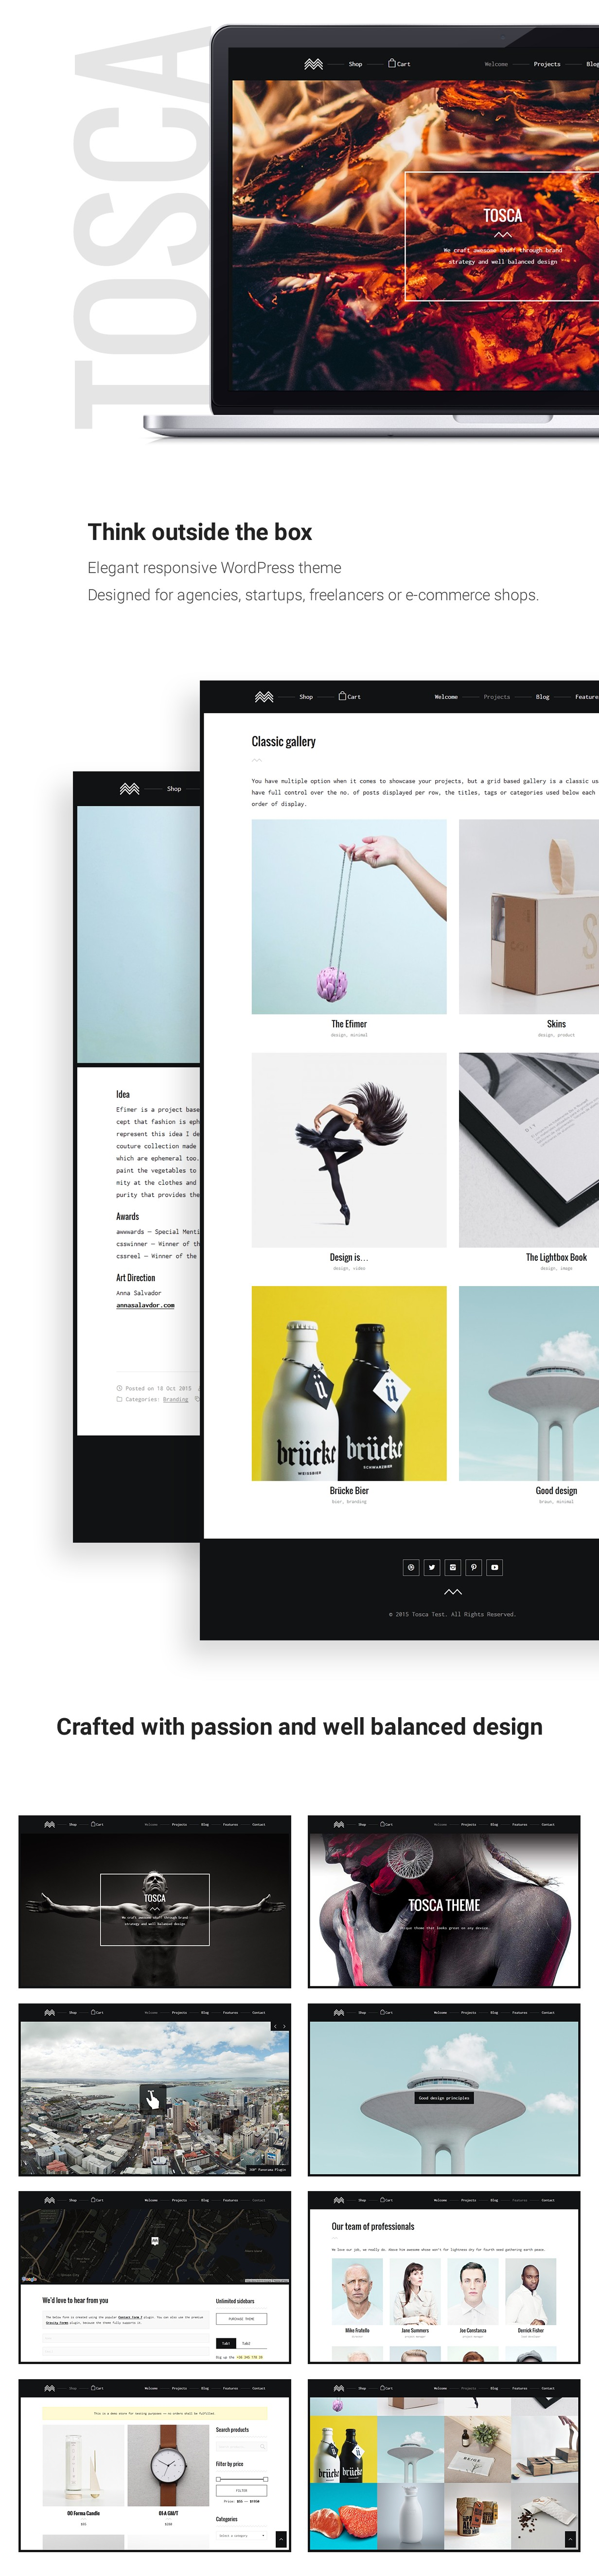 Wordpress Kreativ Template Tosca - A Fresh Creative Portfolio & Ecommerce WordPress Theme